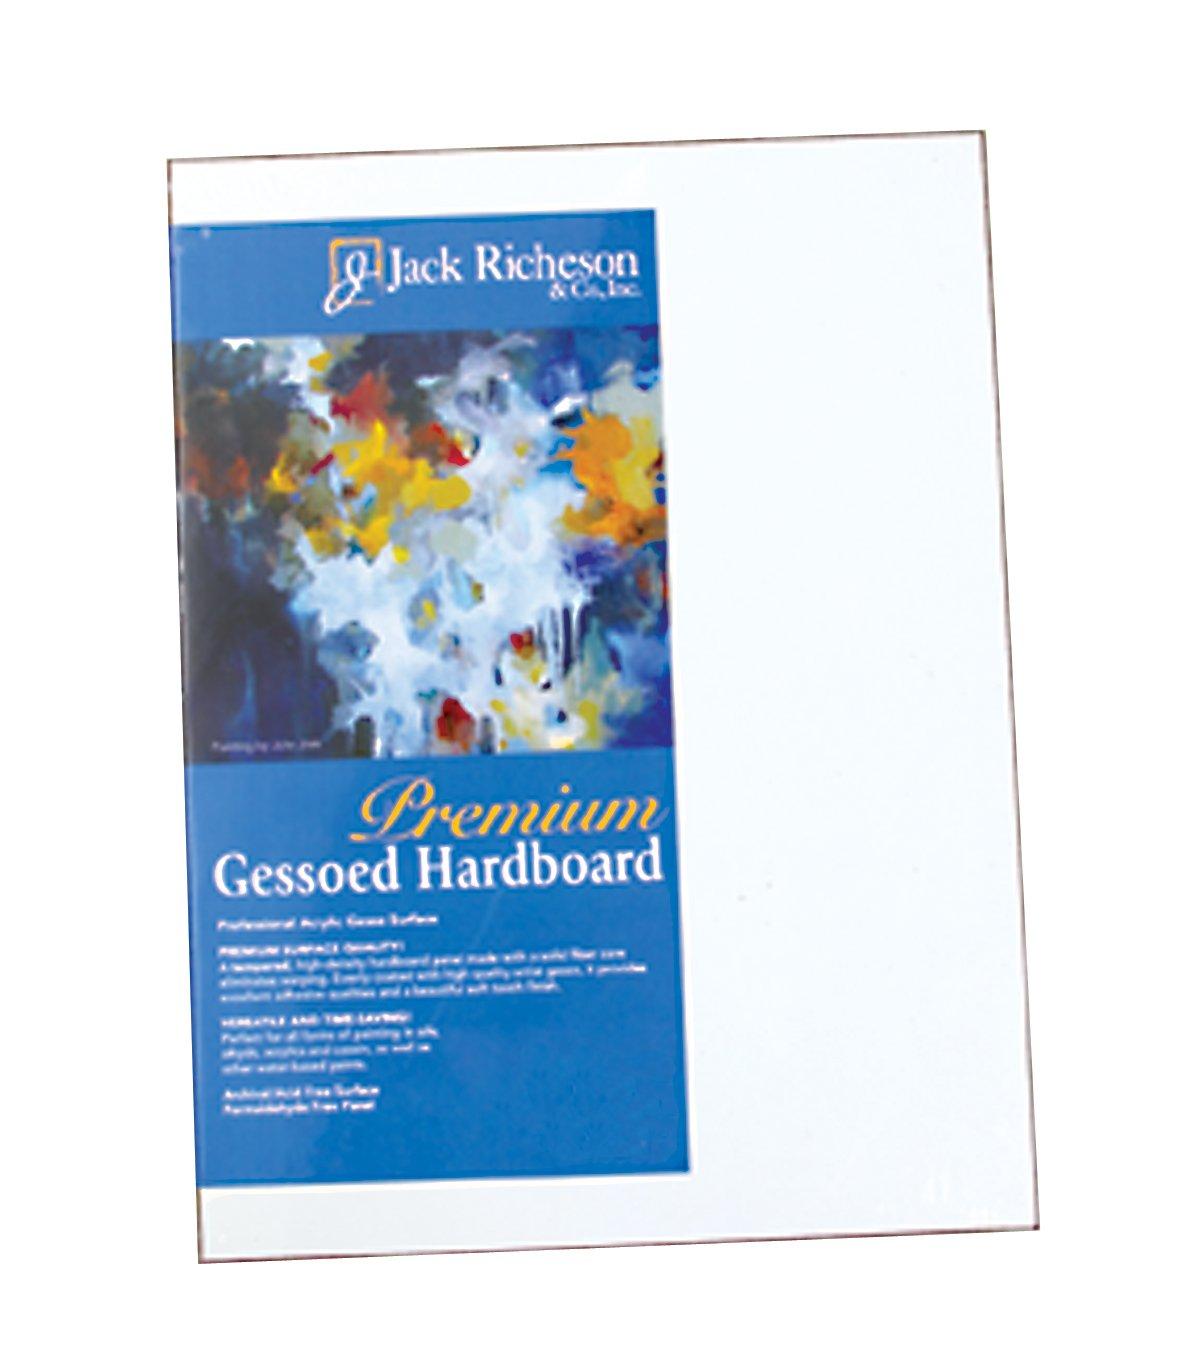 Jack Richeson 1/8-Inch Premium Tempered Gessoed Hardboard Panel, 18-Inch by 24-Inch